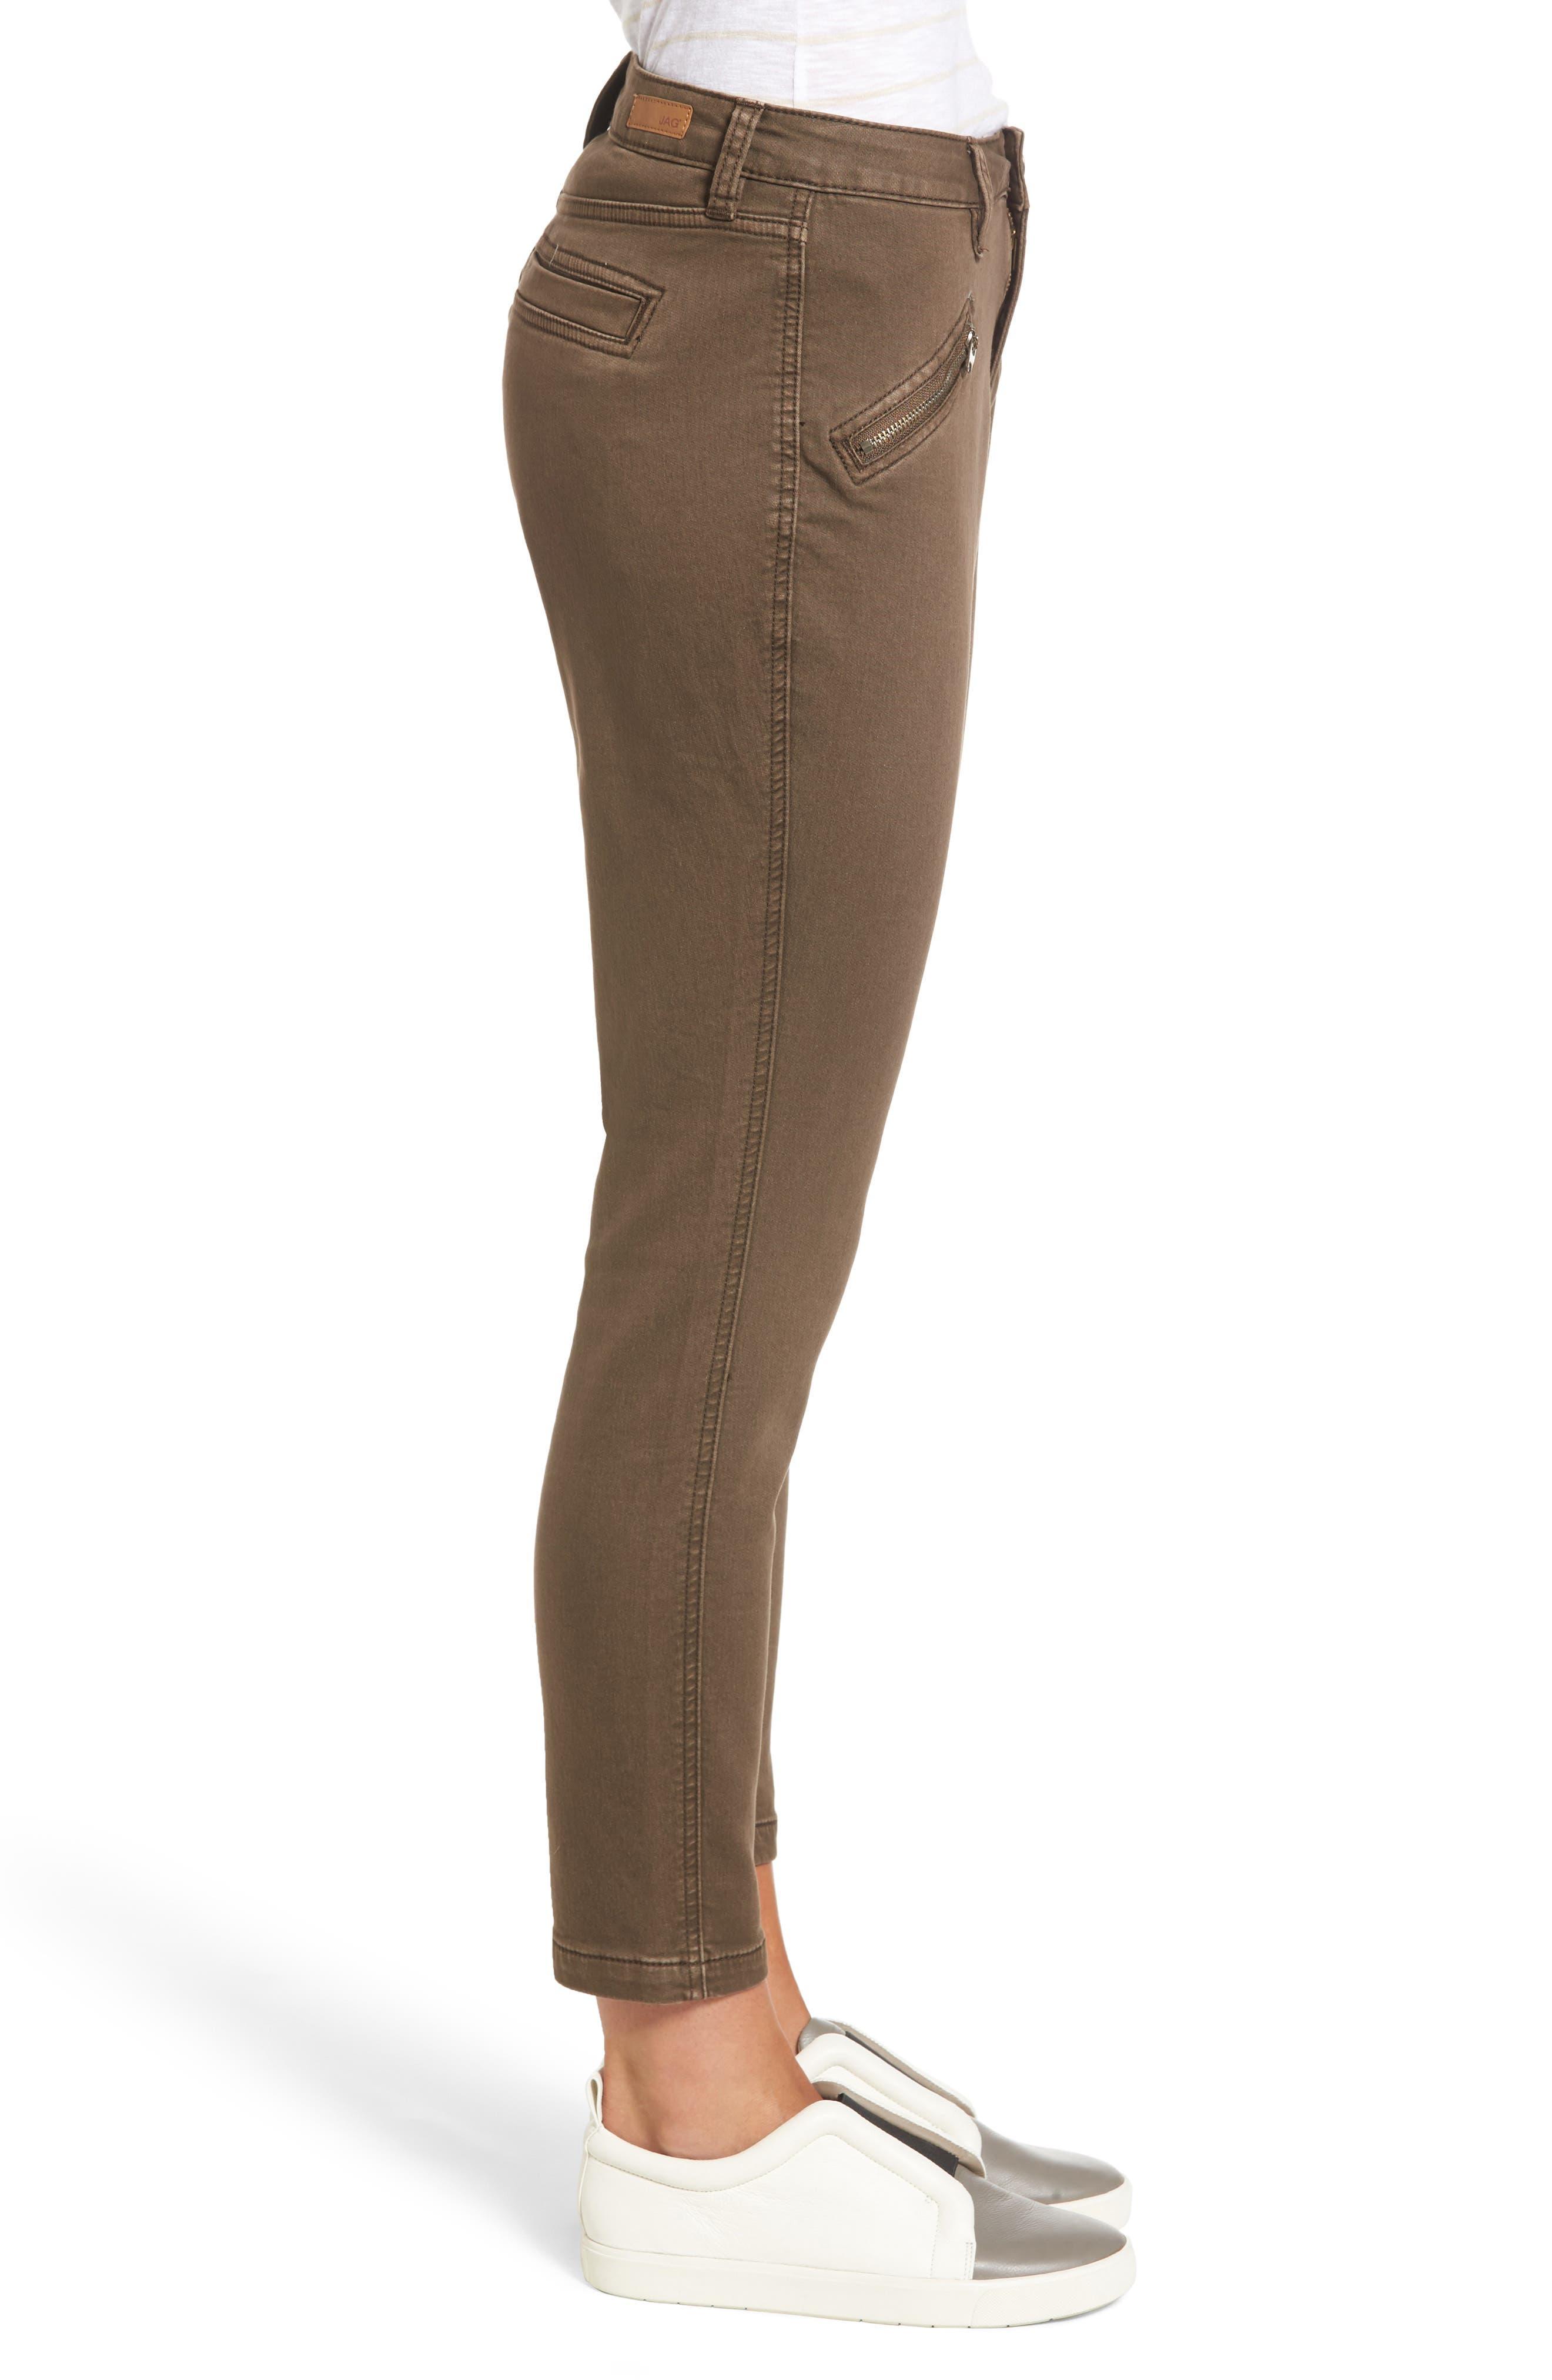 Alternate Image 3  - Jag Jeans Ryan Knit Skinny Jeans (Saddle)